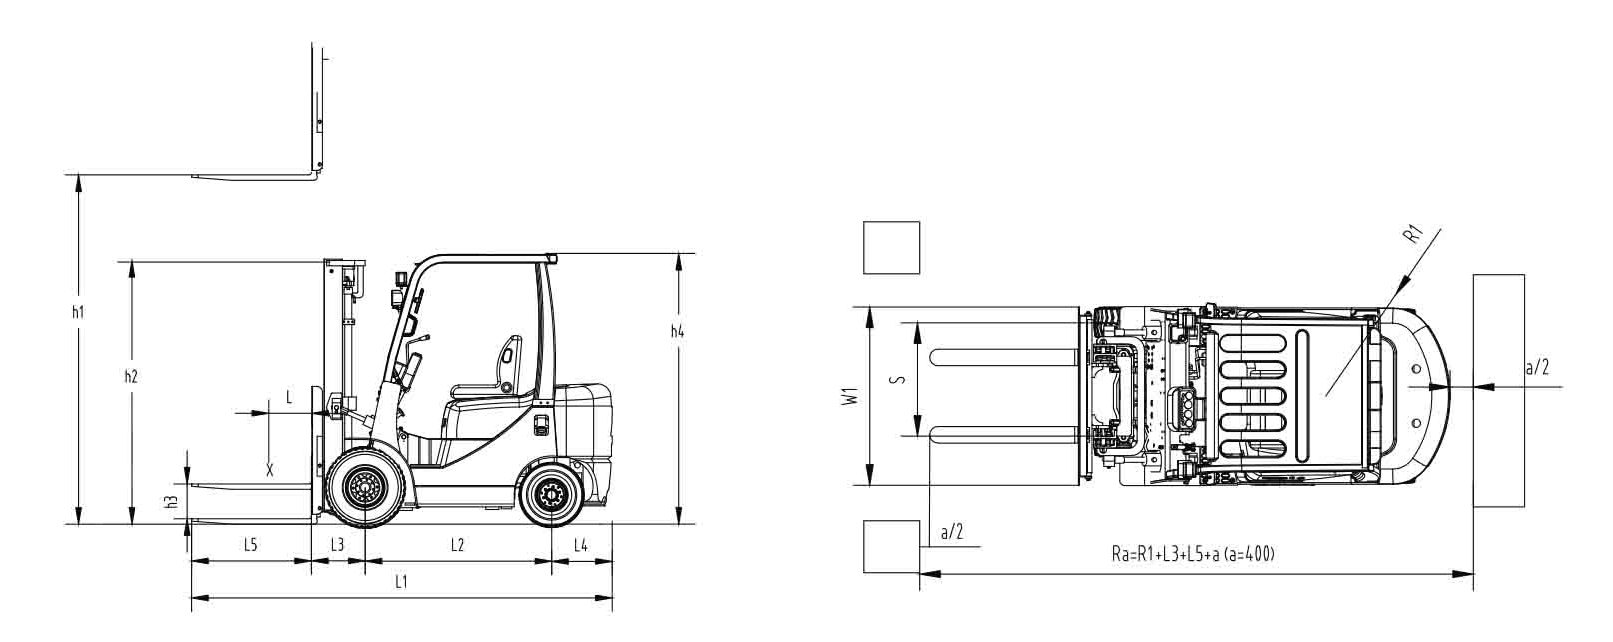 Размеры вилочного погрузчика FD15 FD18 Zoomlion